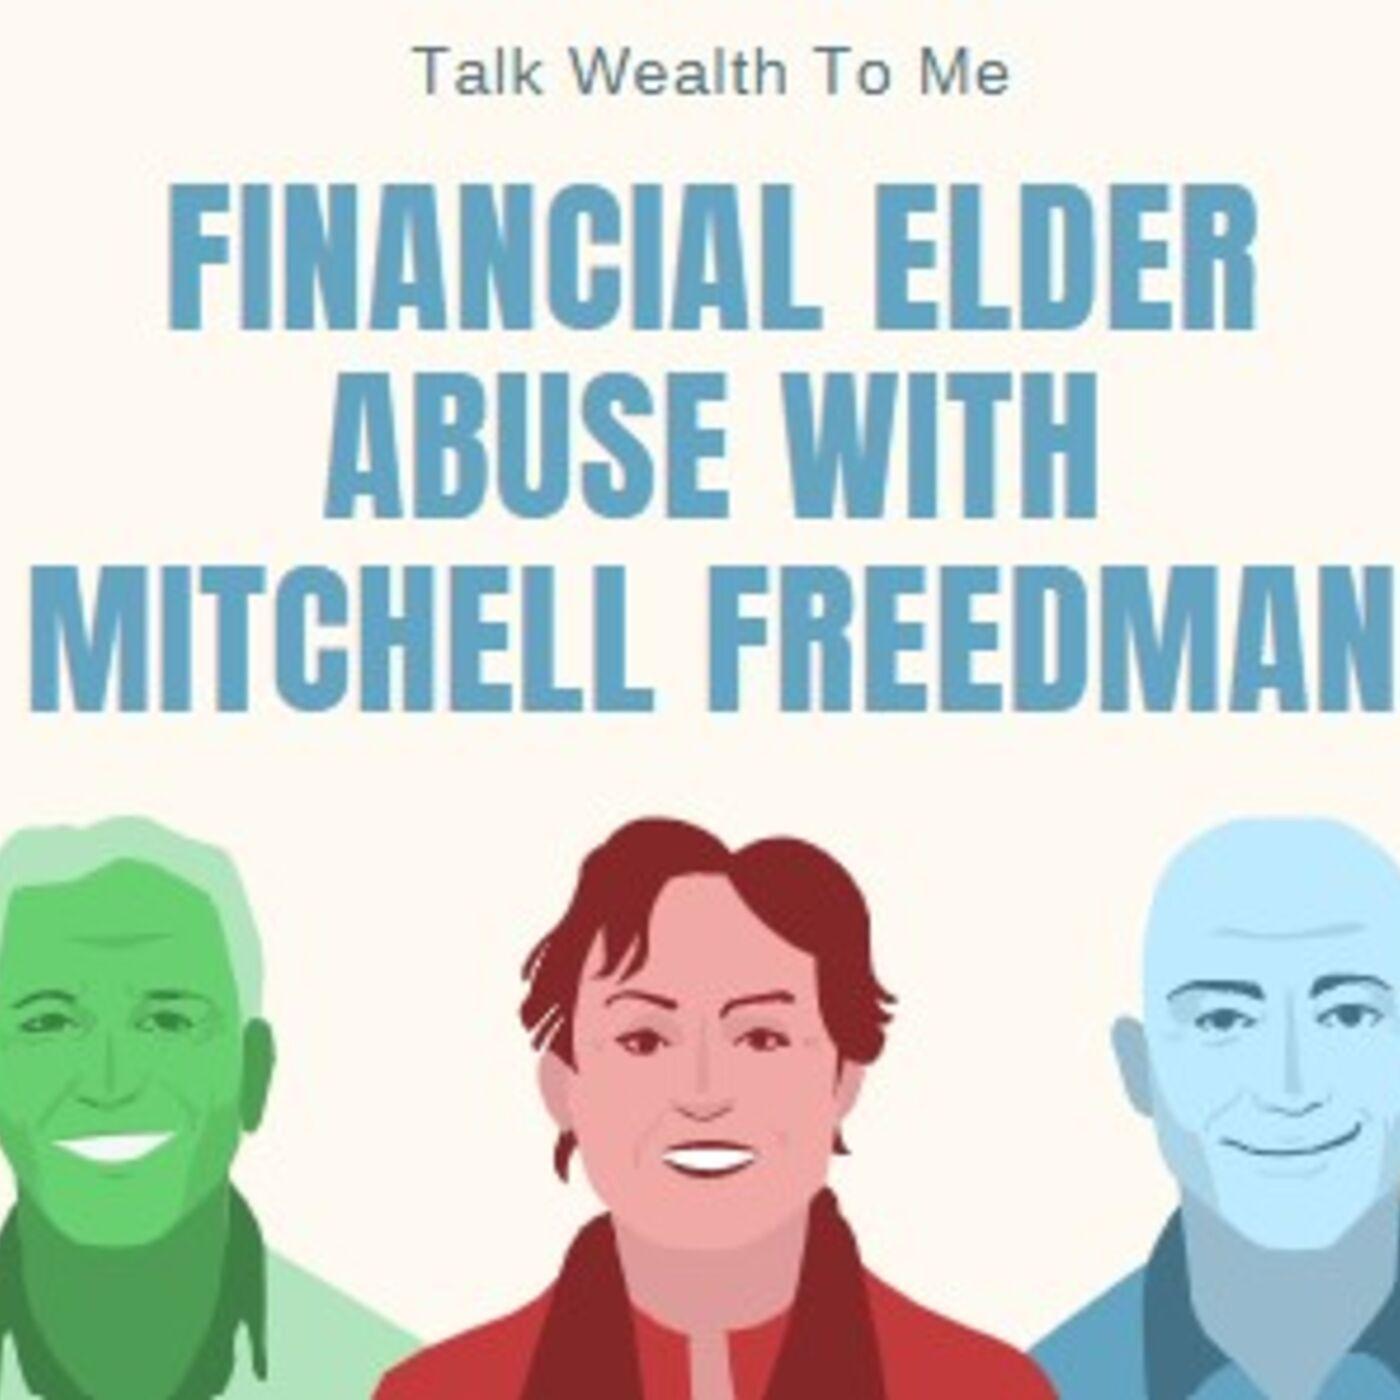 #083 Financial Elder Abuse with Mitchell Freedman